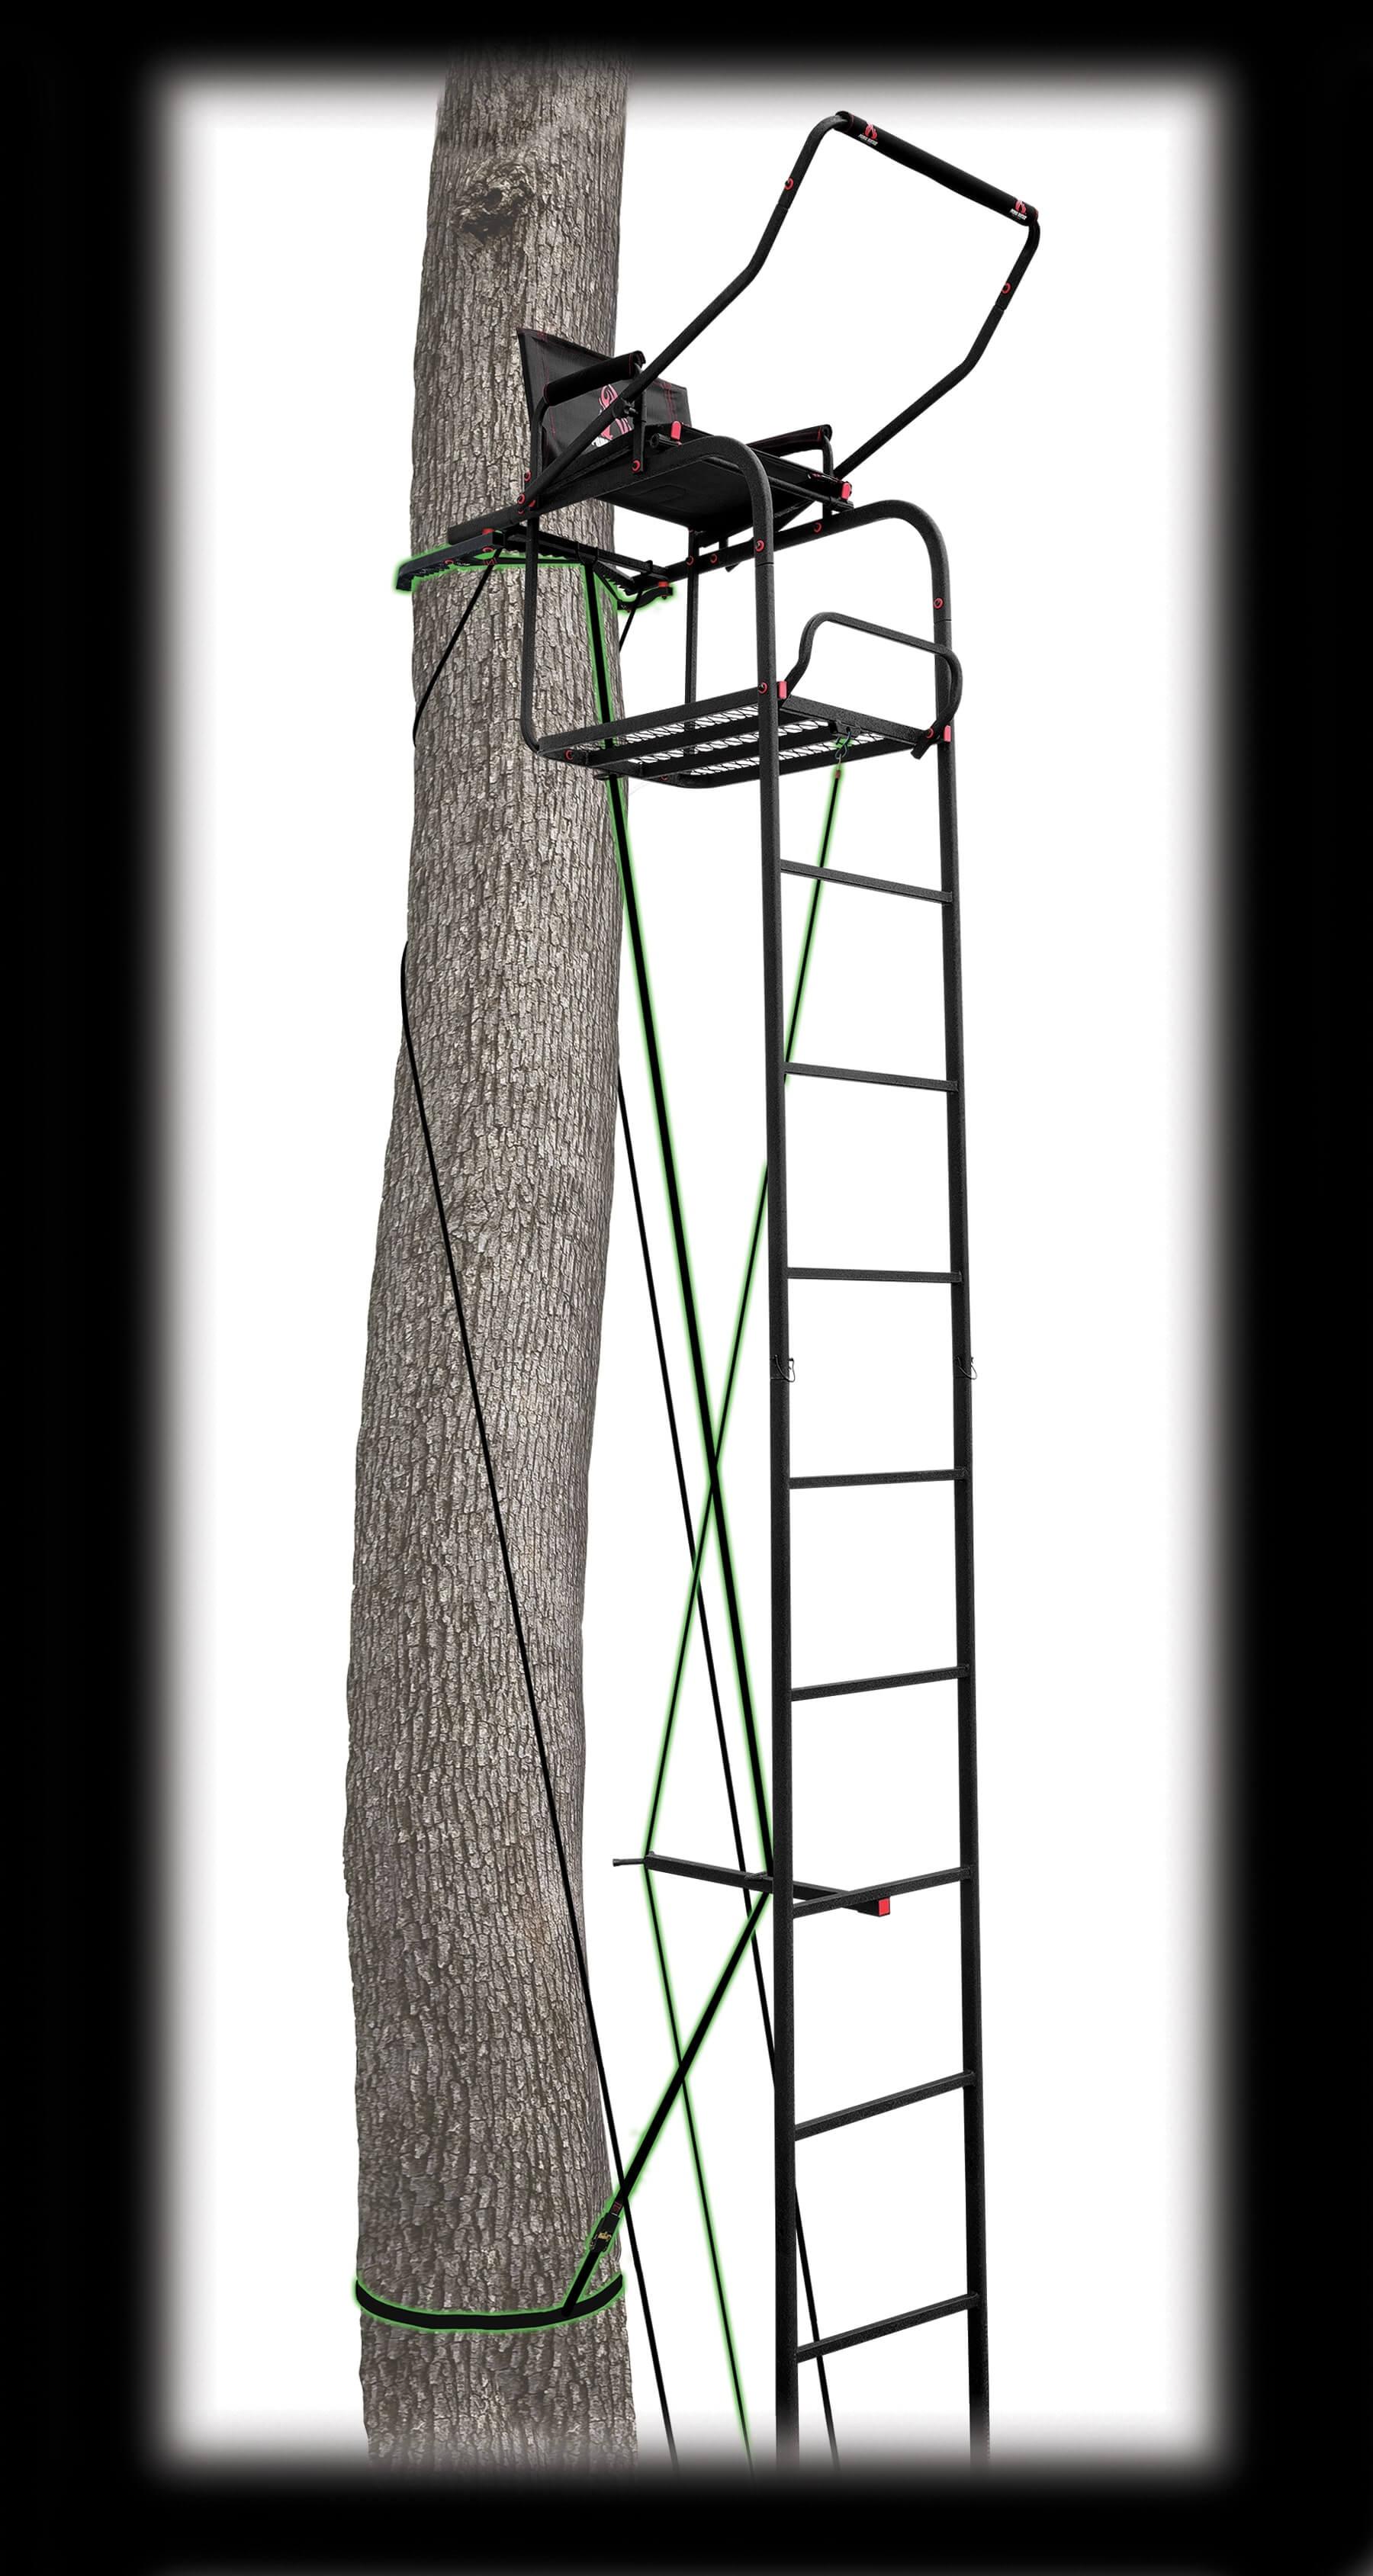 MODEL #PVLS-316 17' SINGLE VANTAGE DELUXE LADDERSTAND